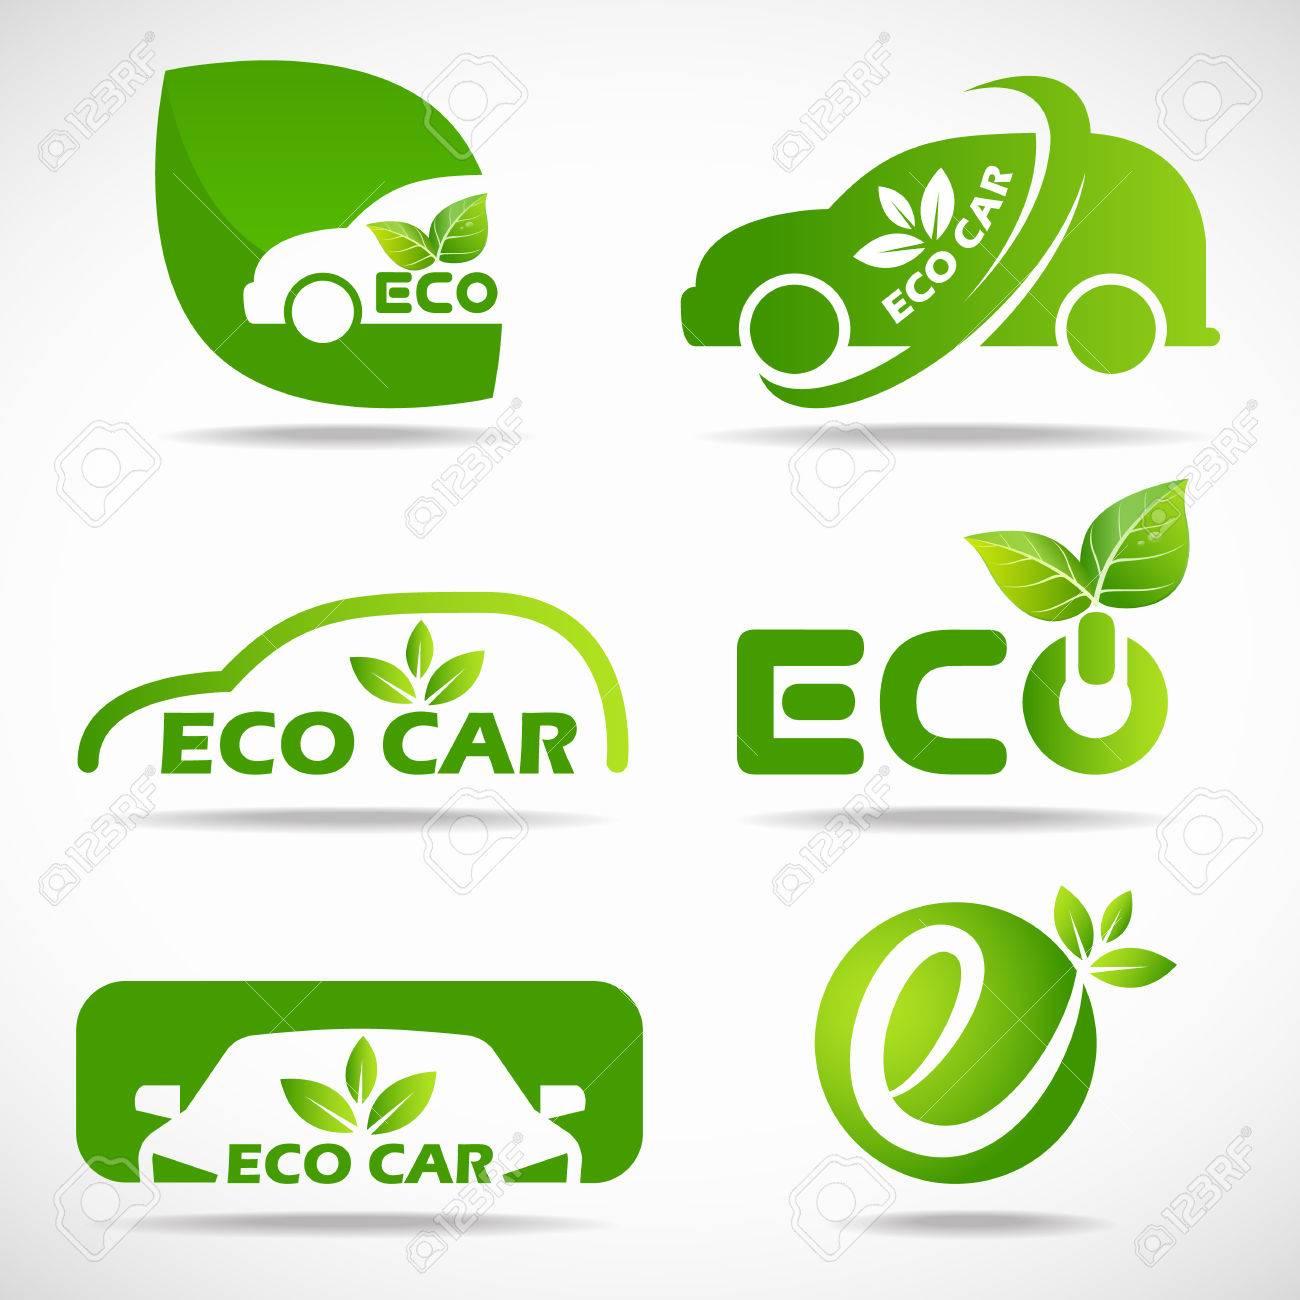 Eco car icon - green leaf and car sign set design - 63507289